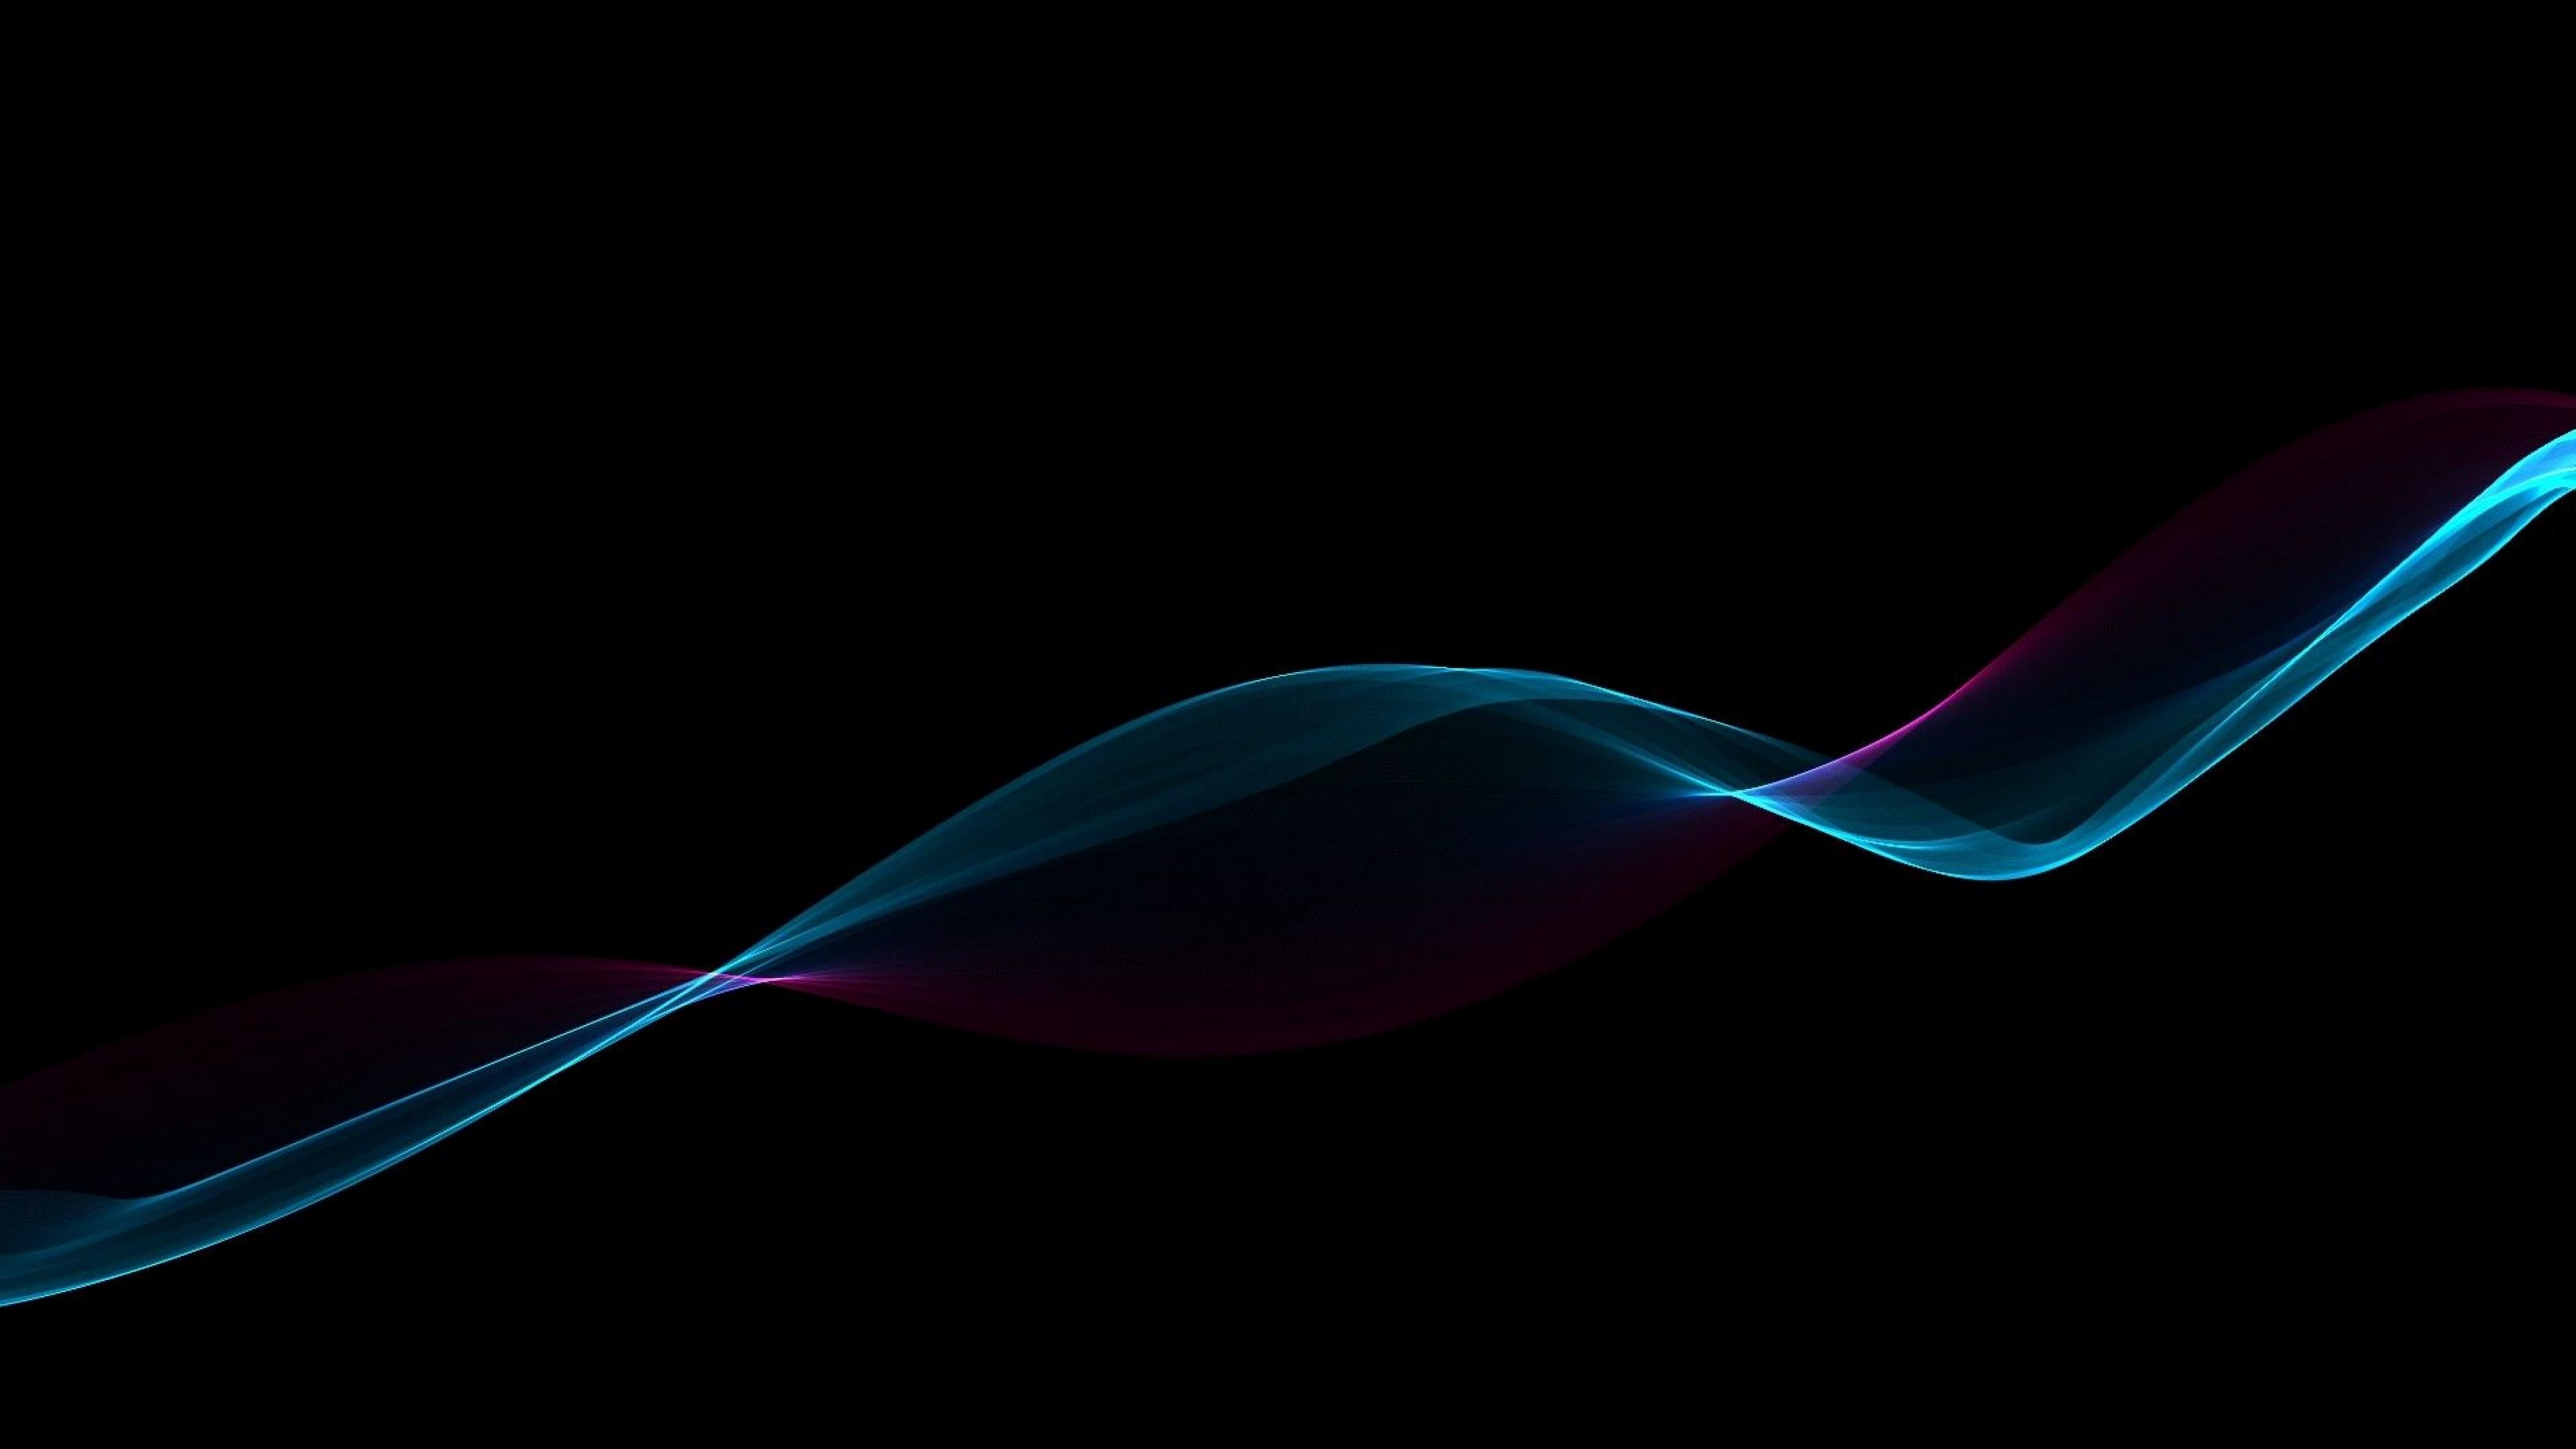 smoke wave background blurred 4k 1539369335 - smoke, wave, background, blurred 4k - Wave, Smoke, Background